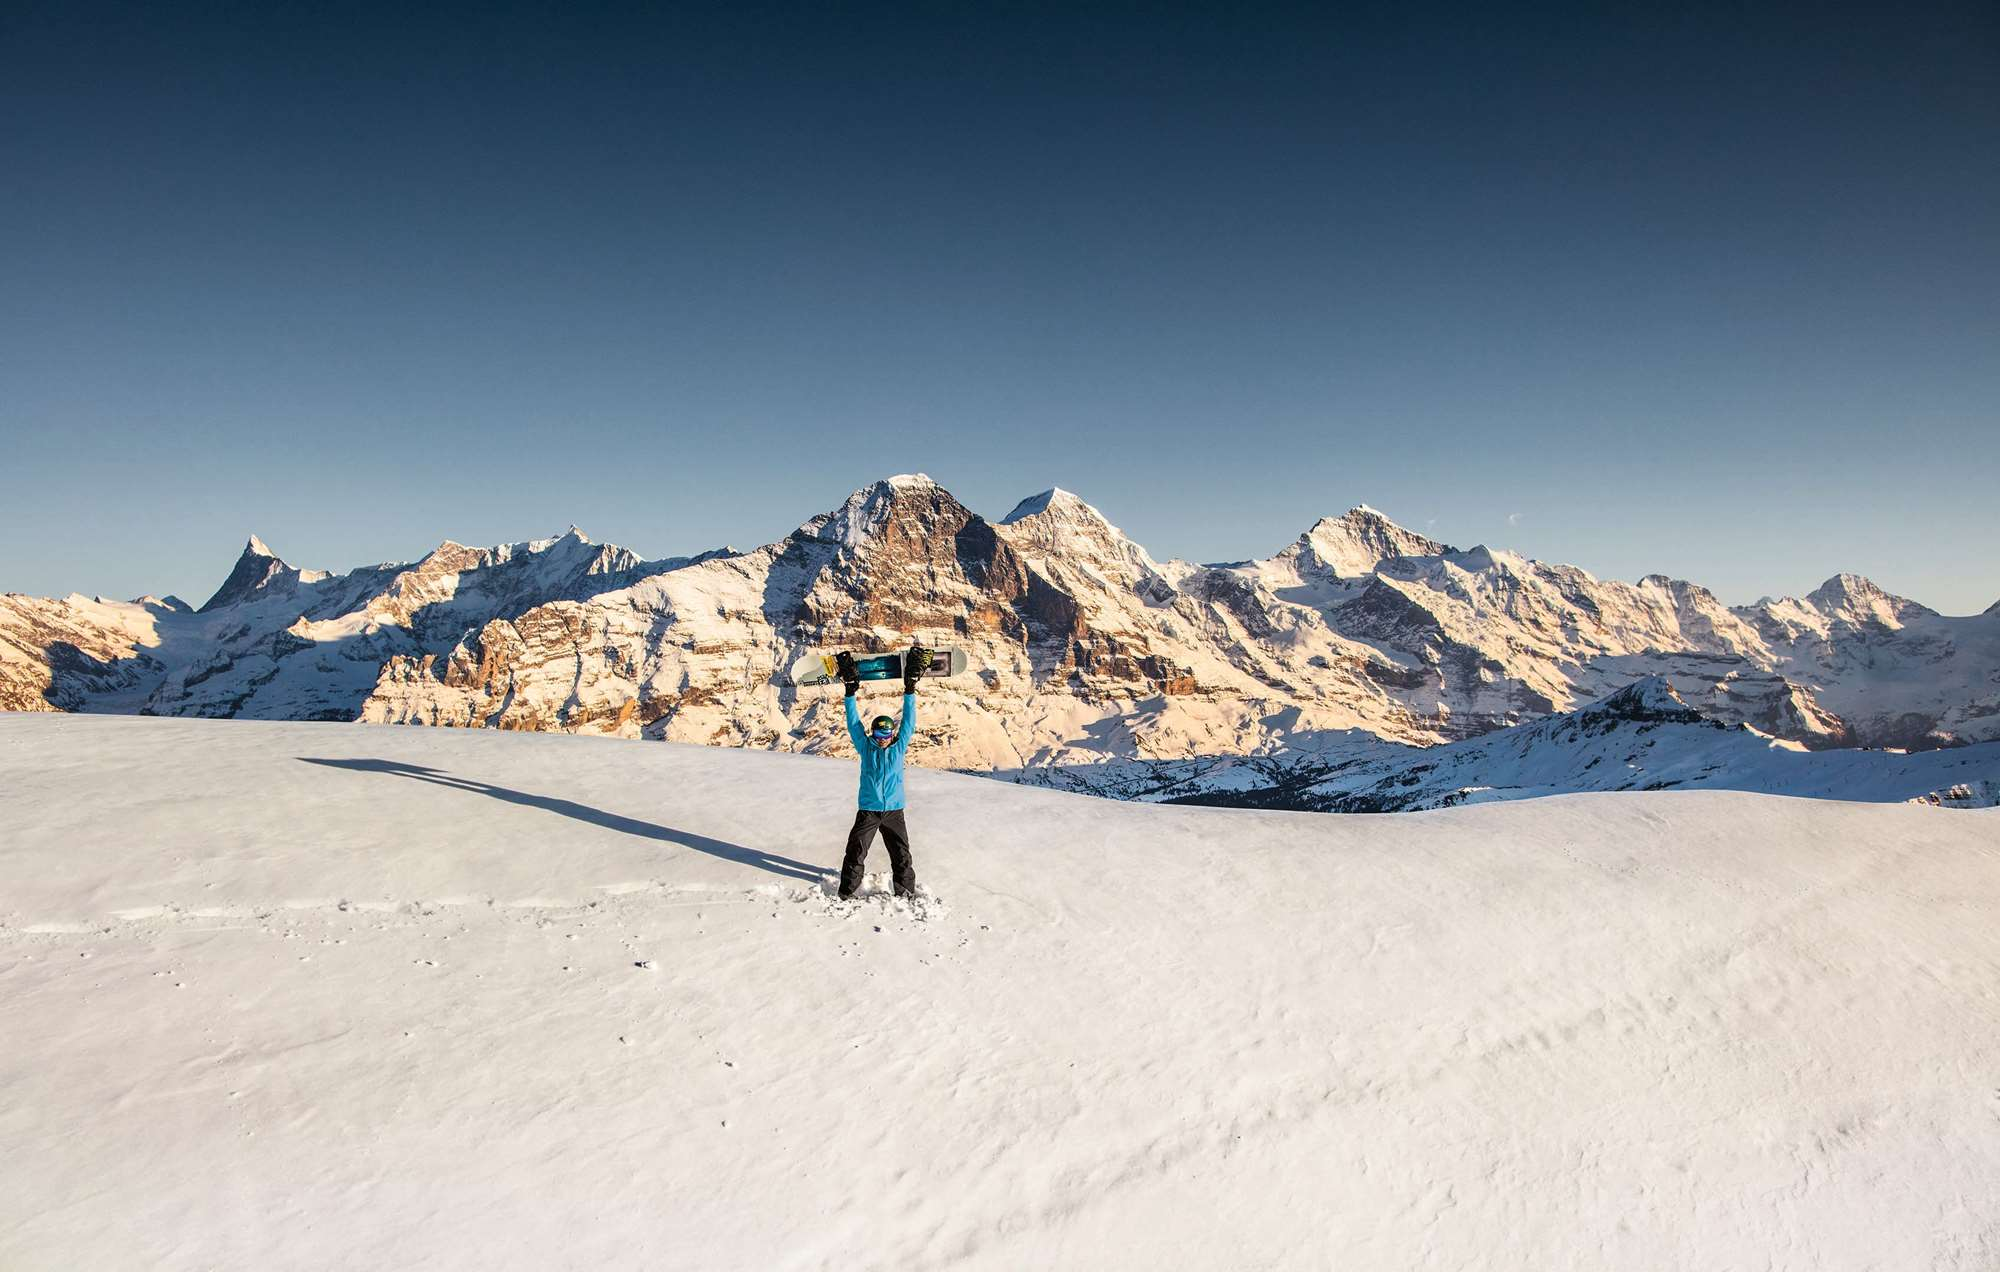 Snowboarding in Lauterbrunnen